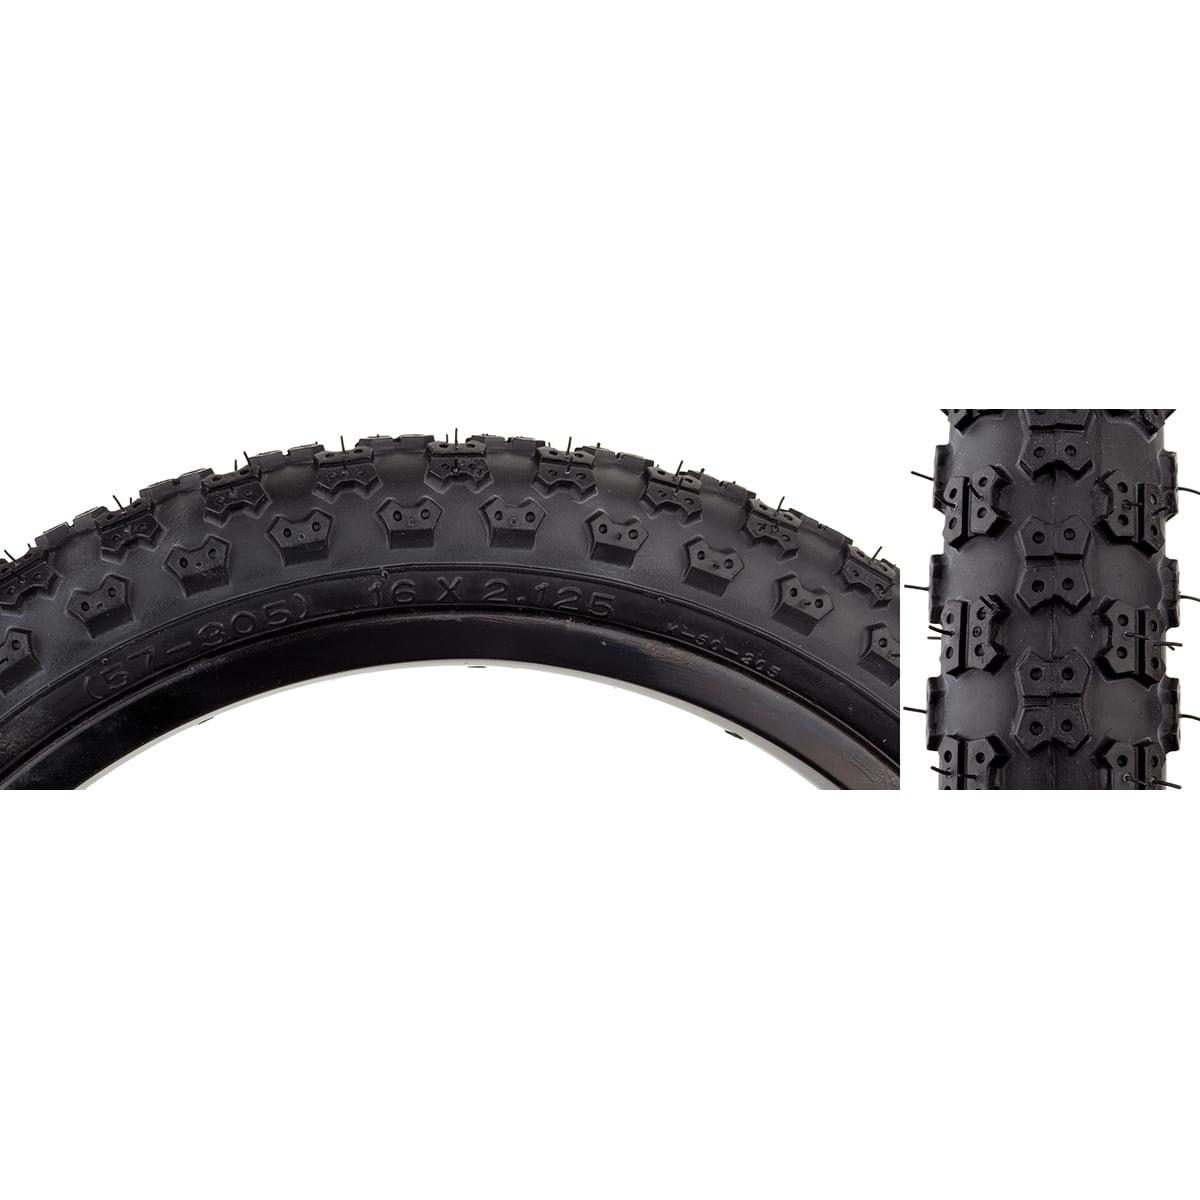 Sunlite Tire 16X2.125 Black/Black Mx3 K50